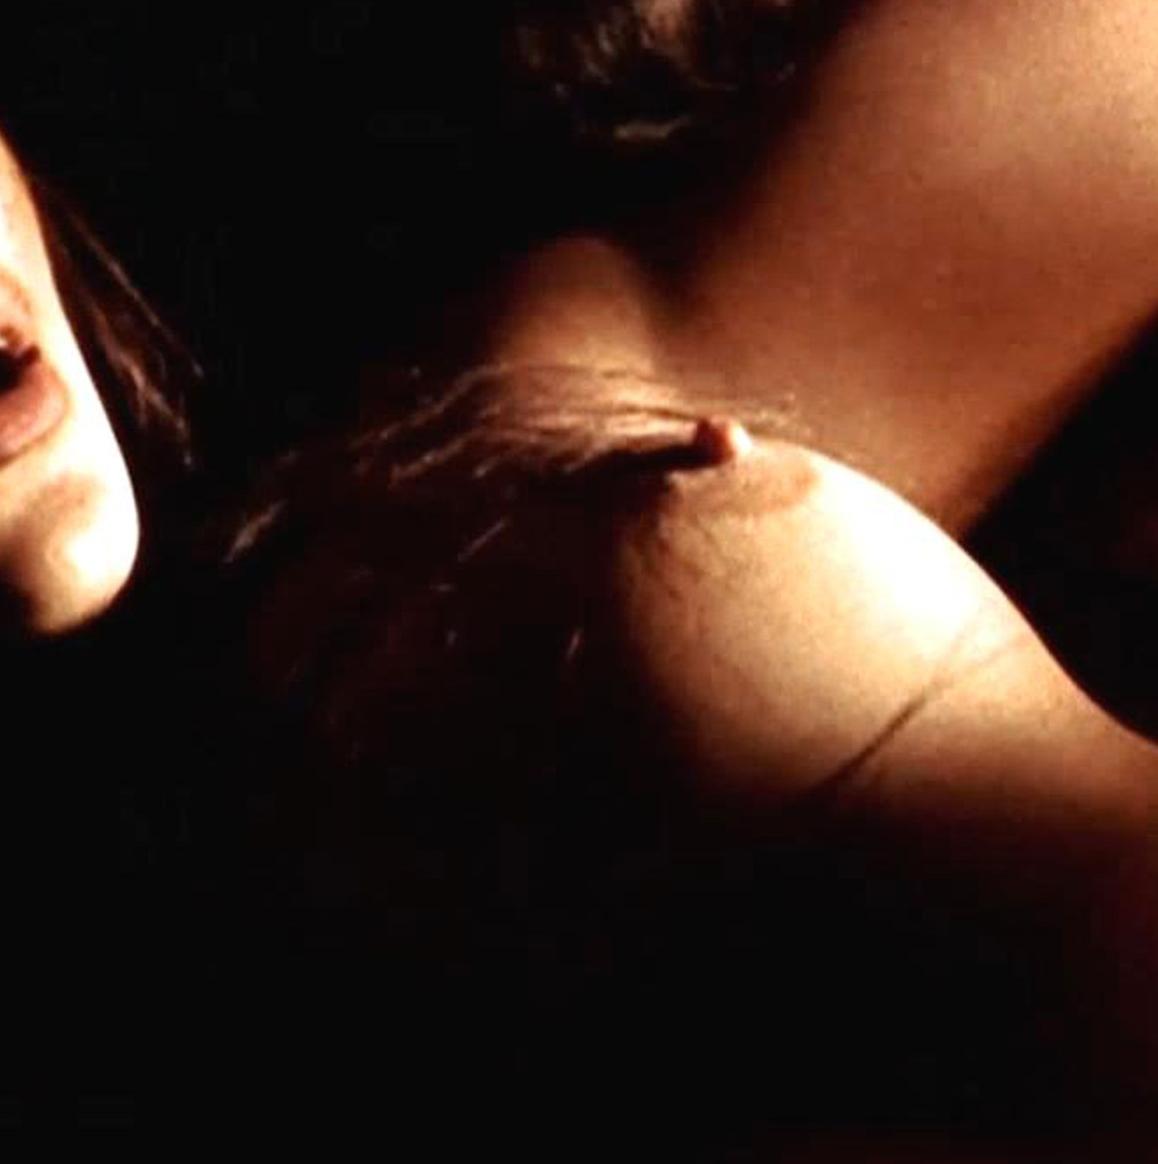 Red haired women sex teacher nude